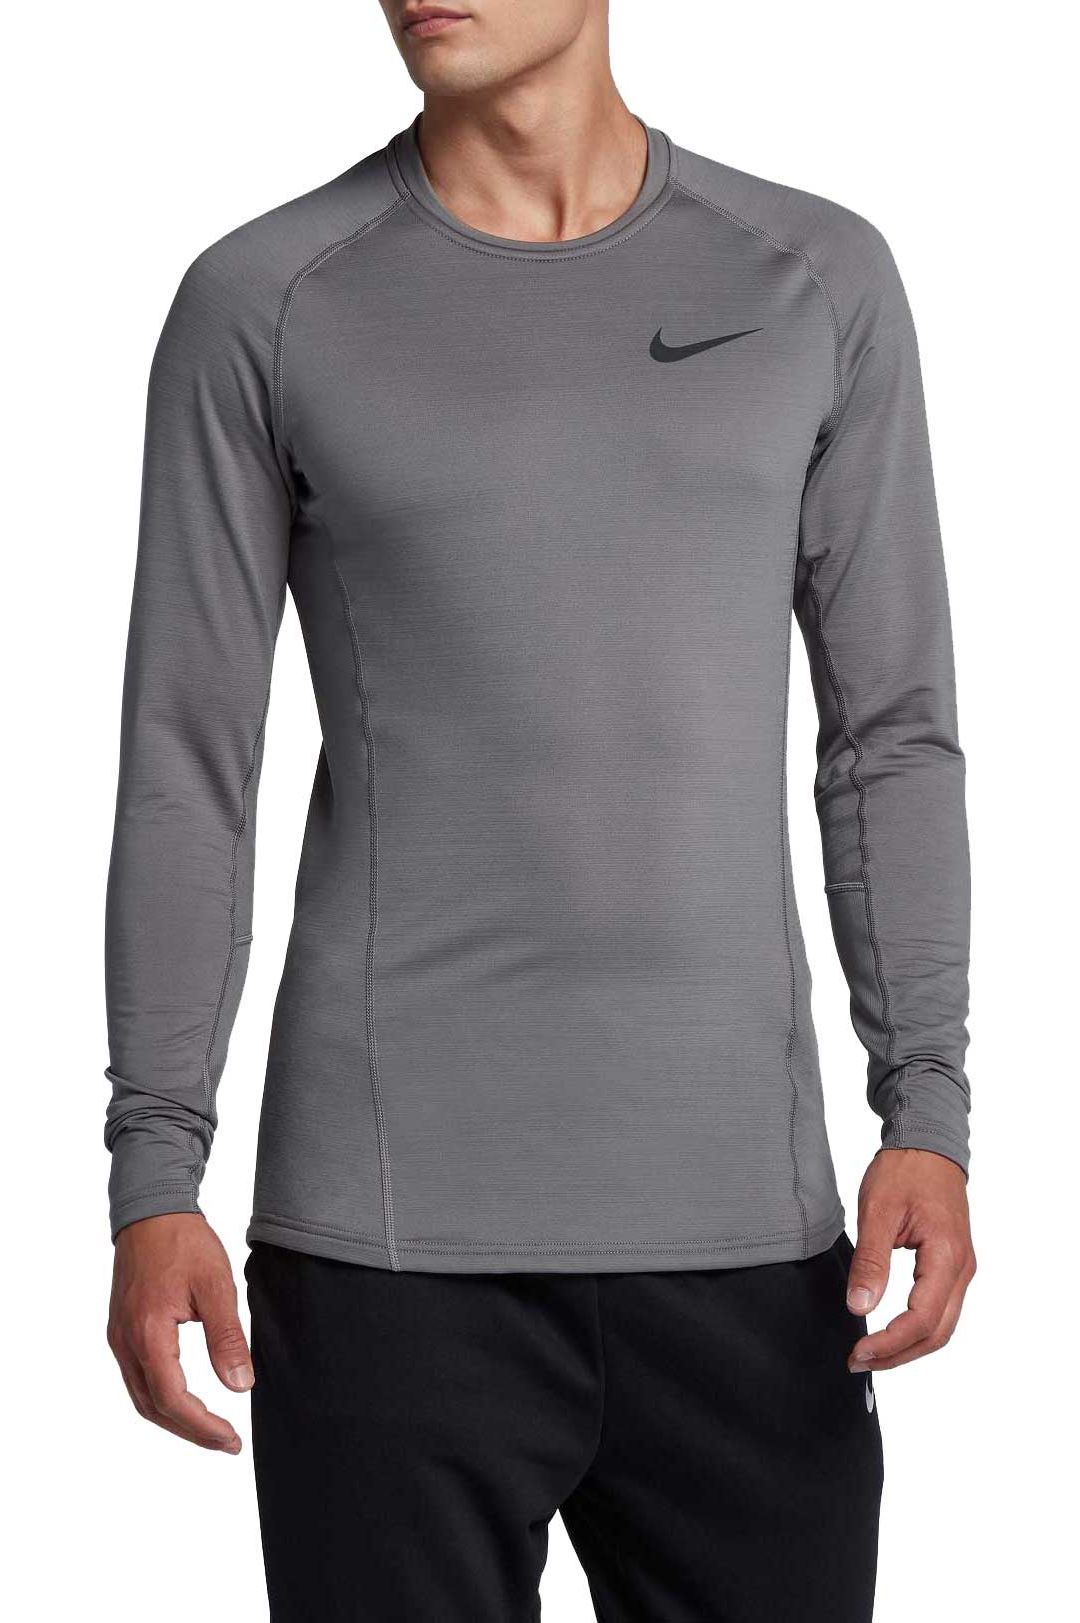 830577077 Nike Men's Pro Therma Dri-FIT Long Sleeve Shirt